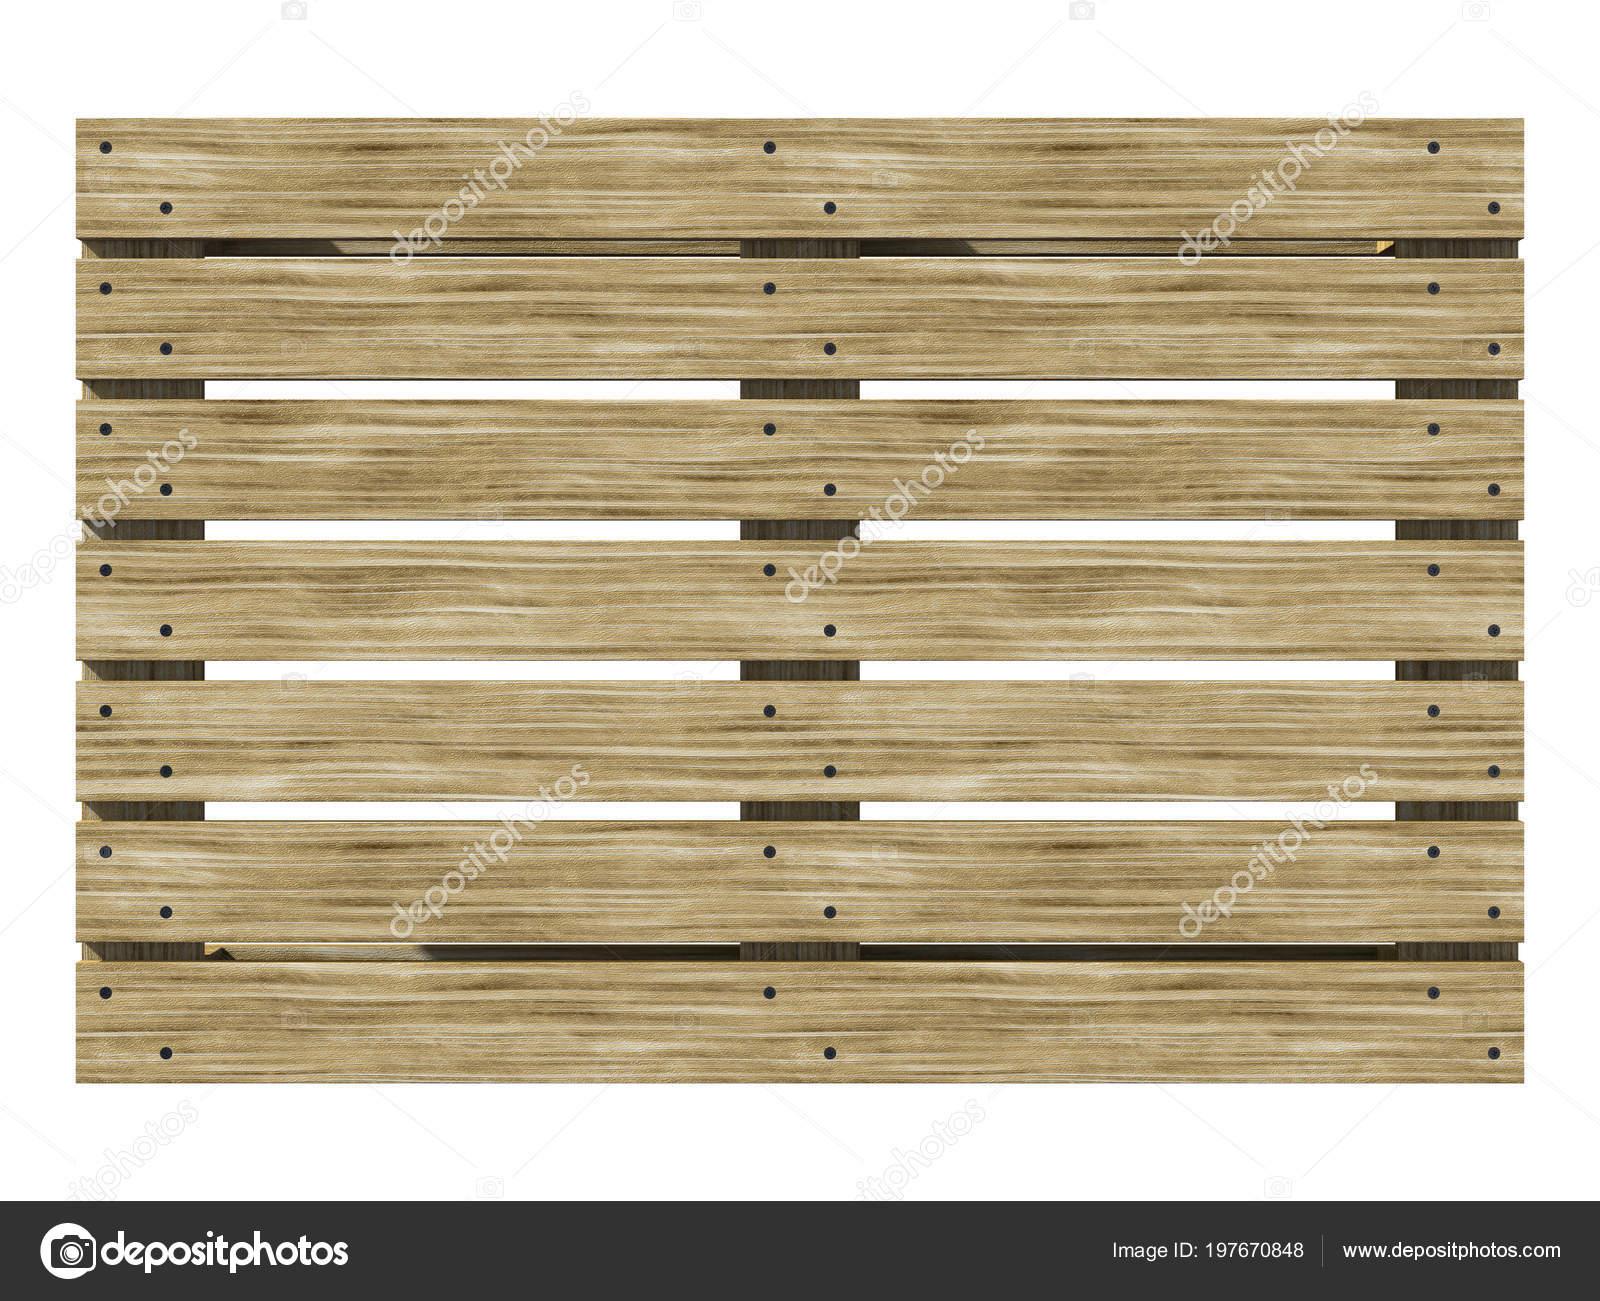 Wooden Euro Pane Top View Texture Pallet Illustration Stock Photo